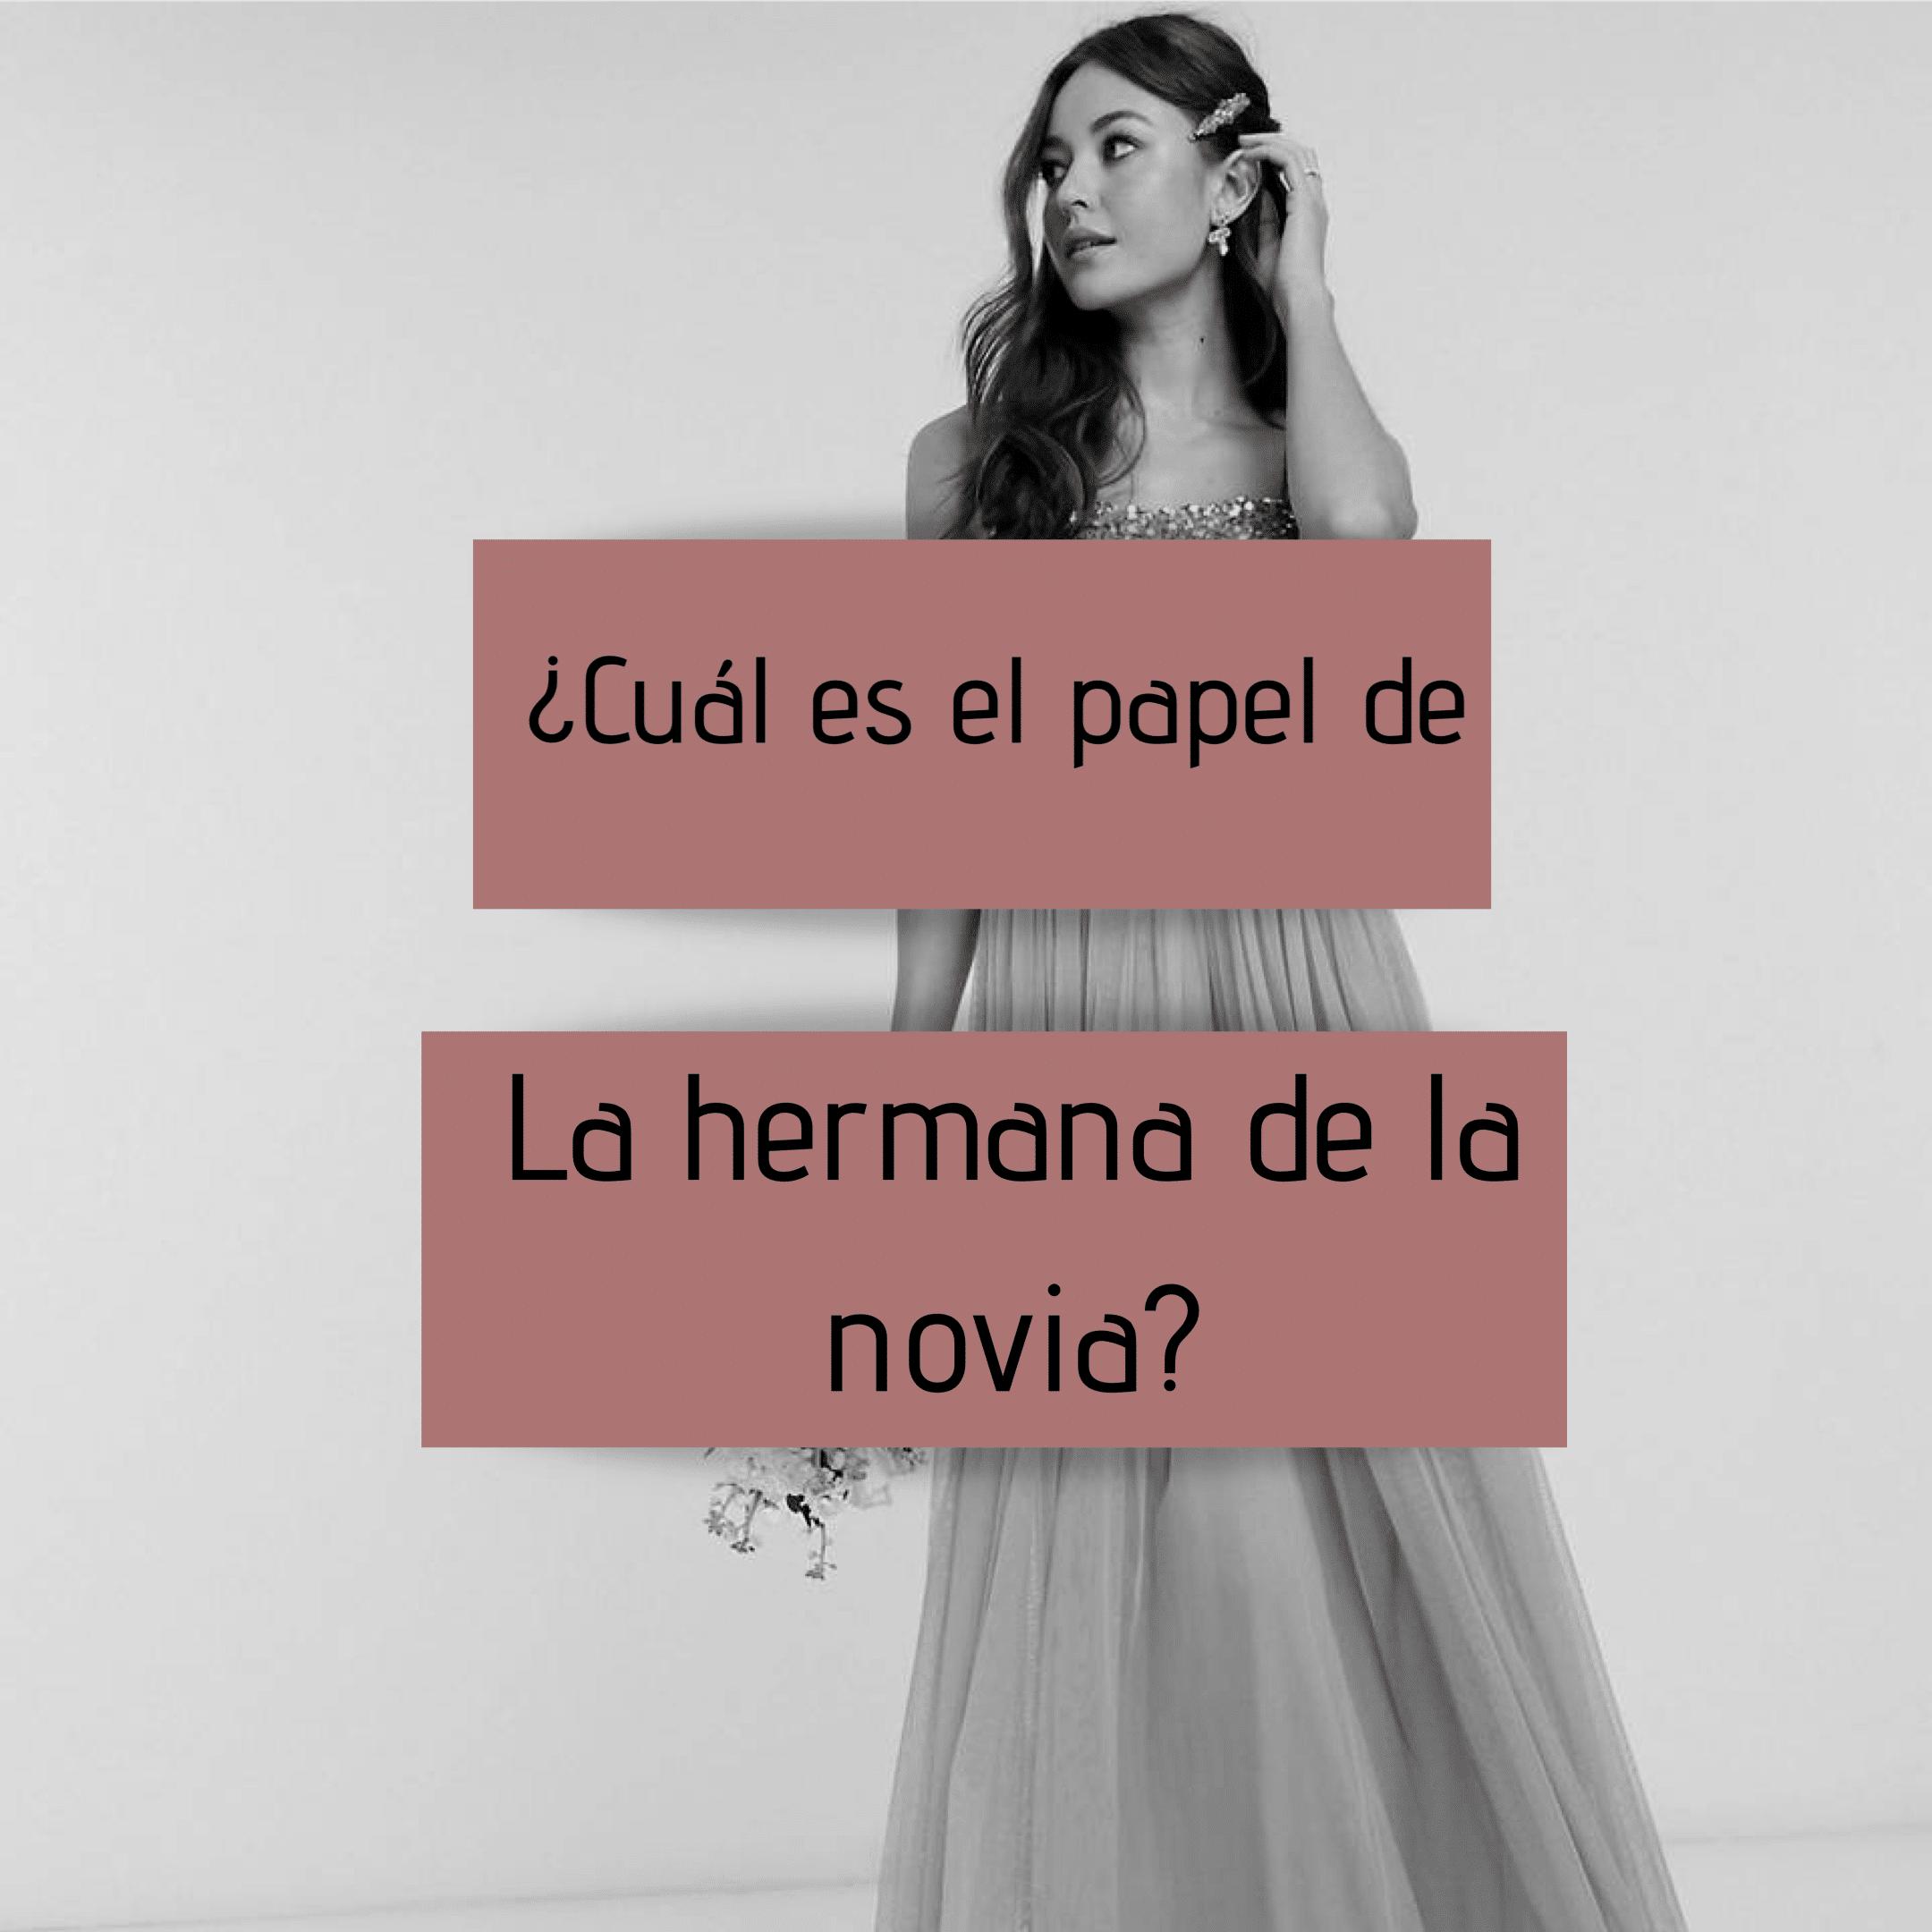 ¿Cuál es el papel de la hermana de la novia?